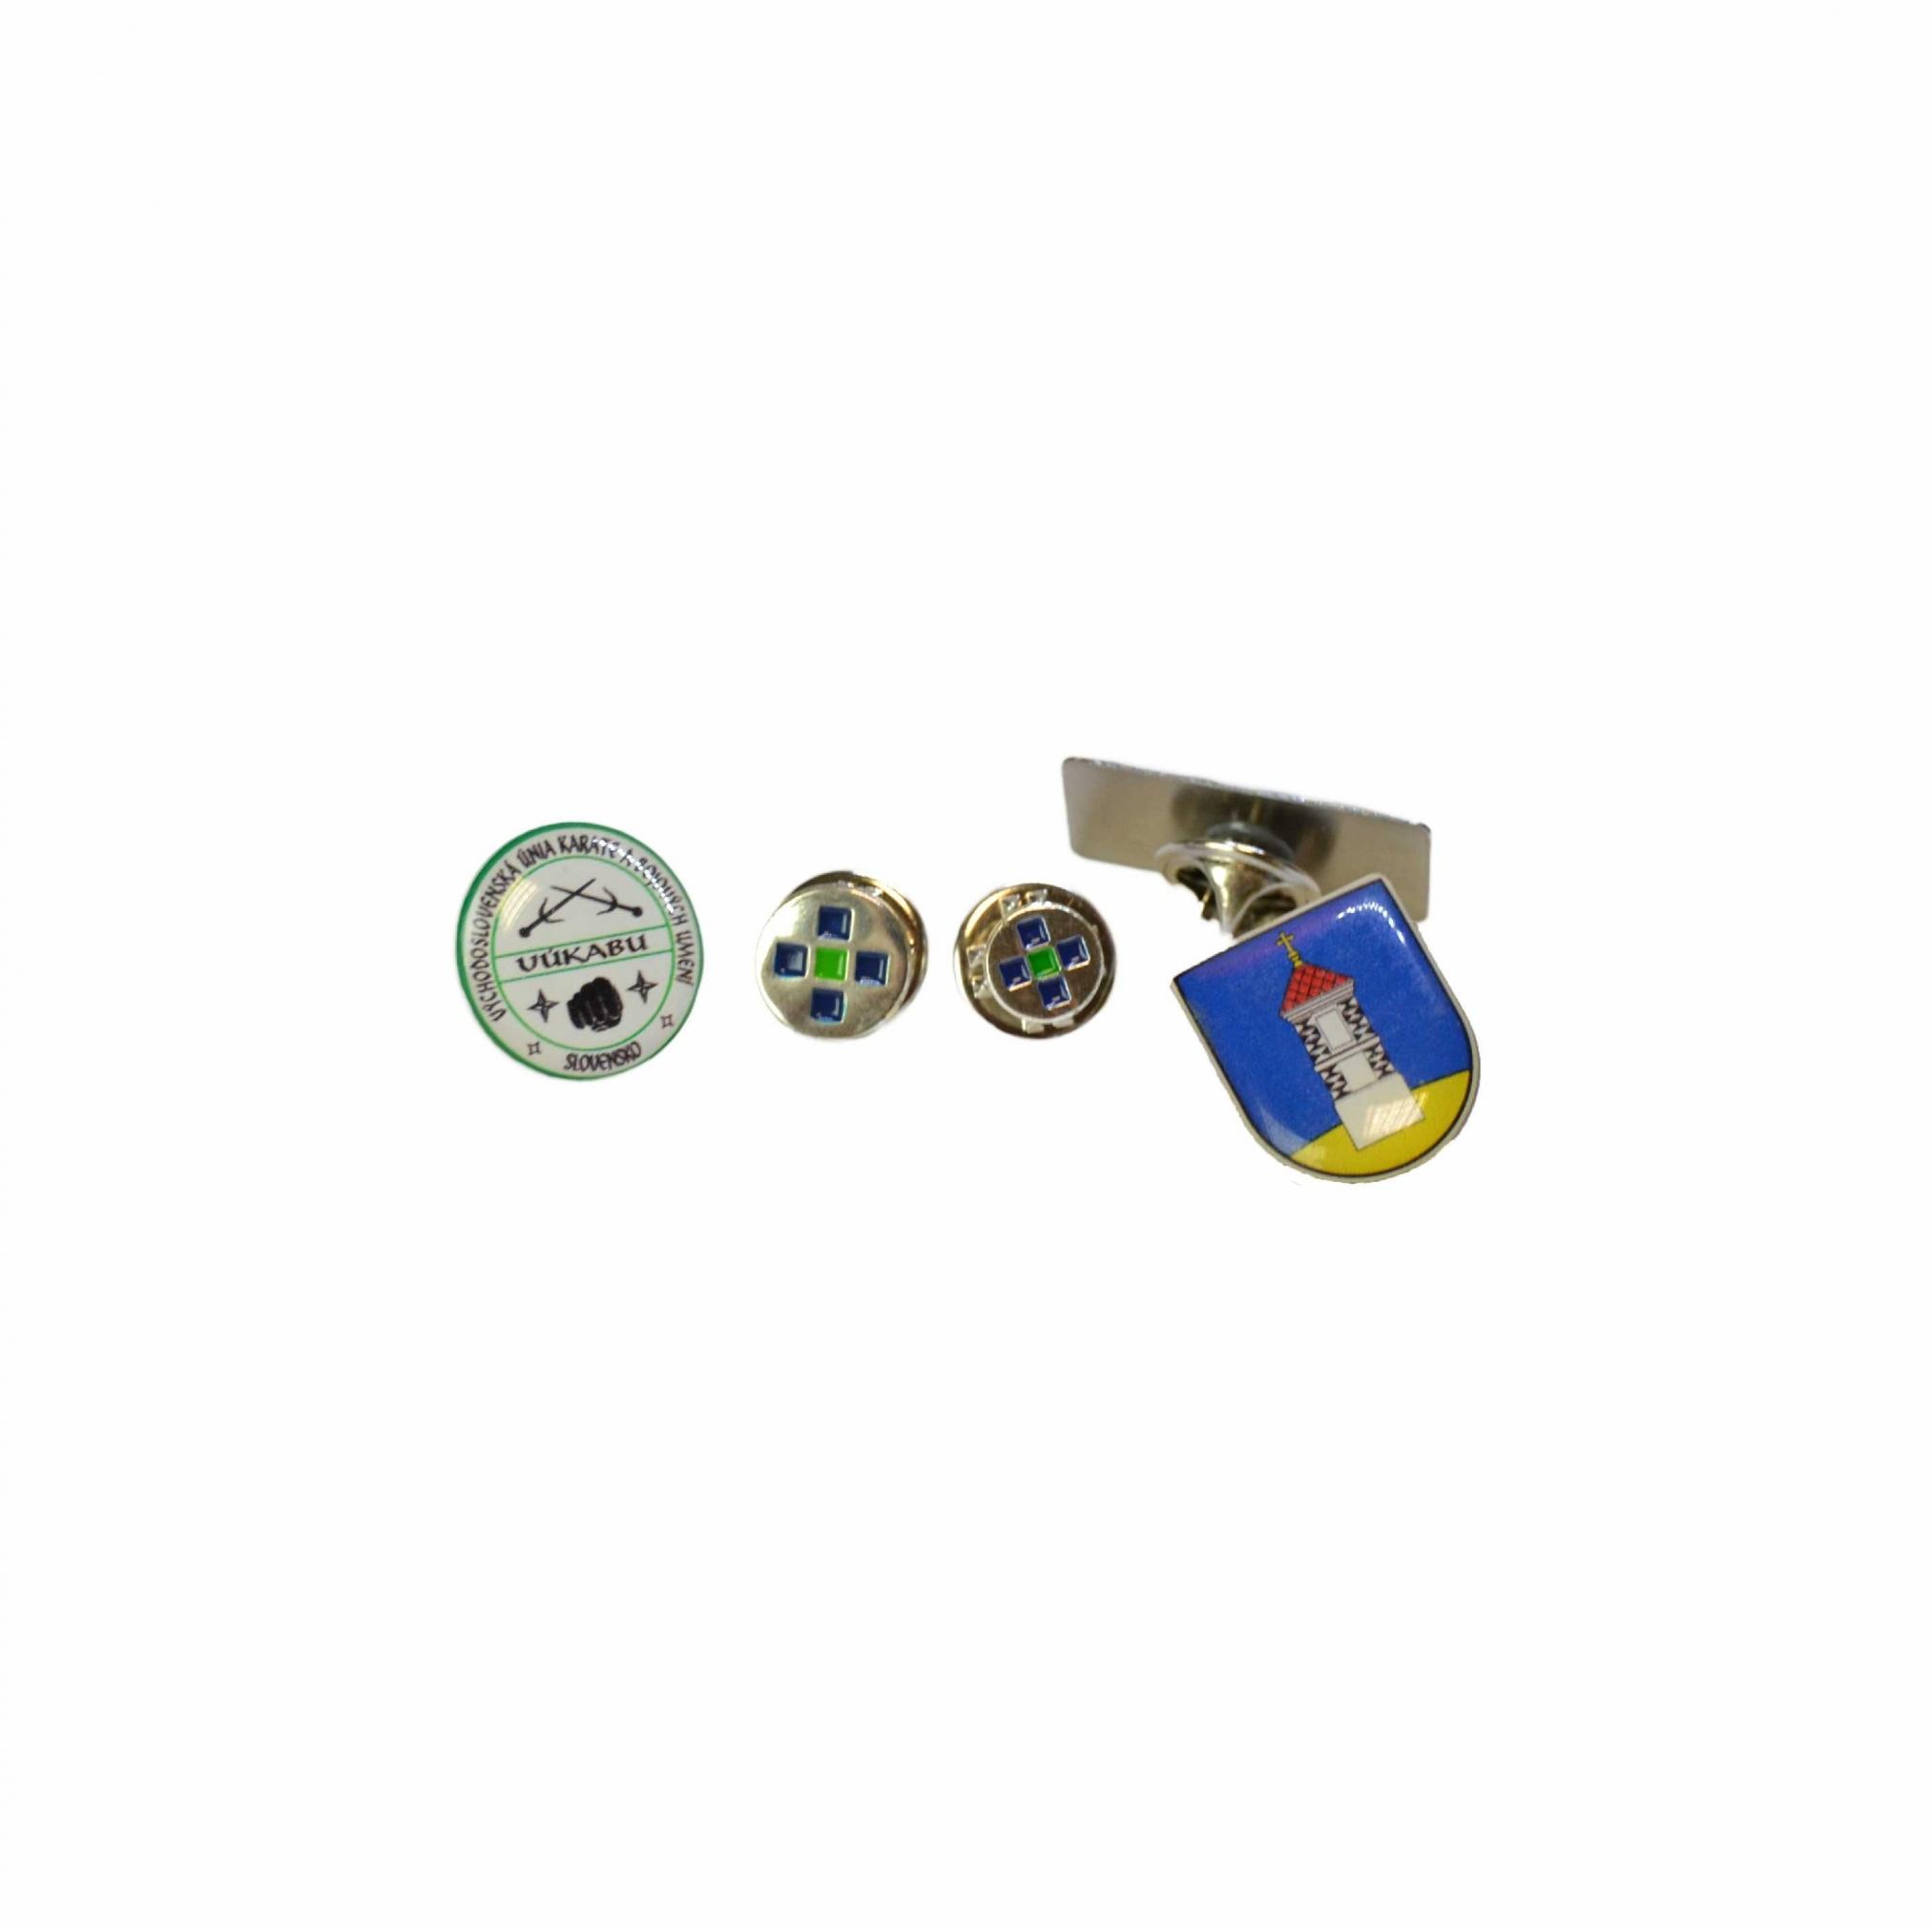 3cf59a20c Kovové odznaky, butony | Lamia